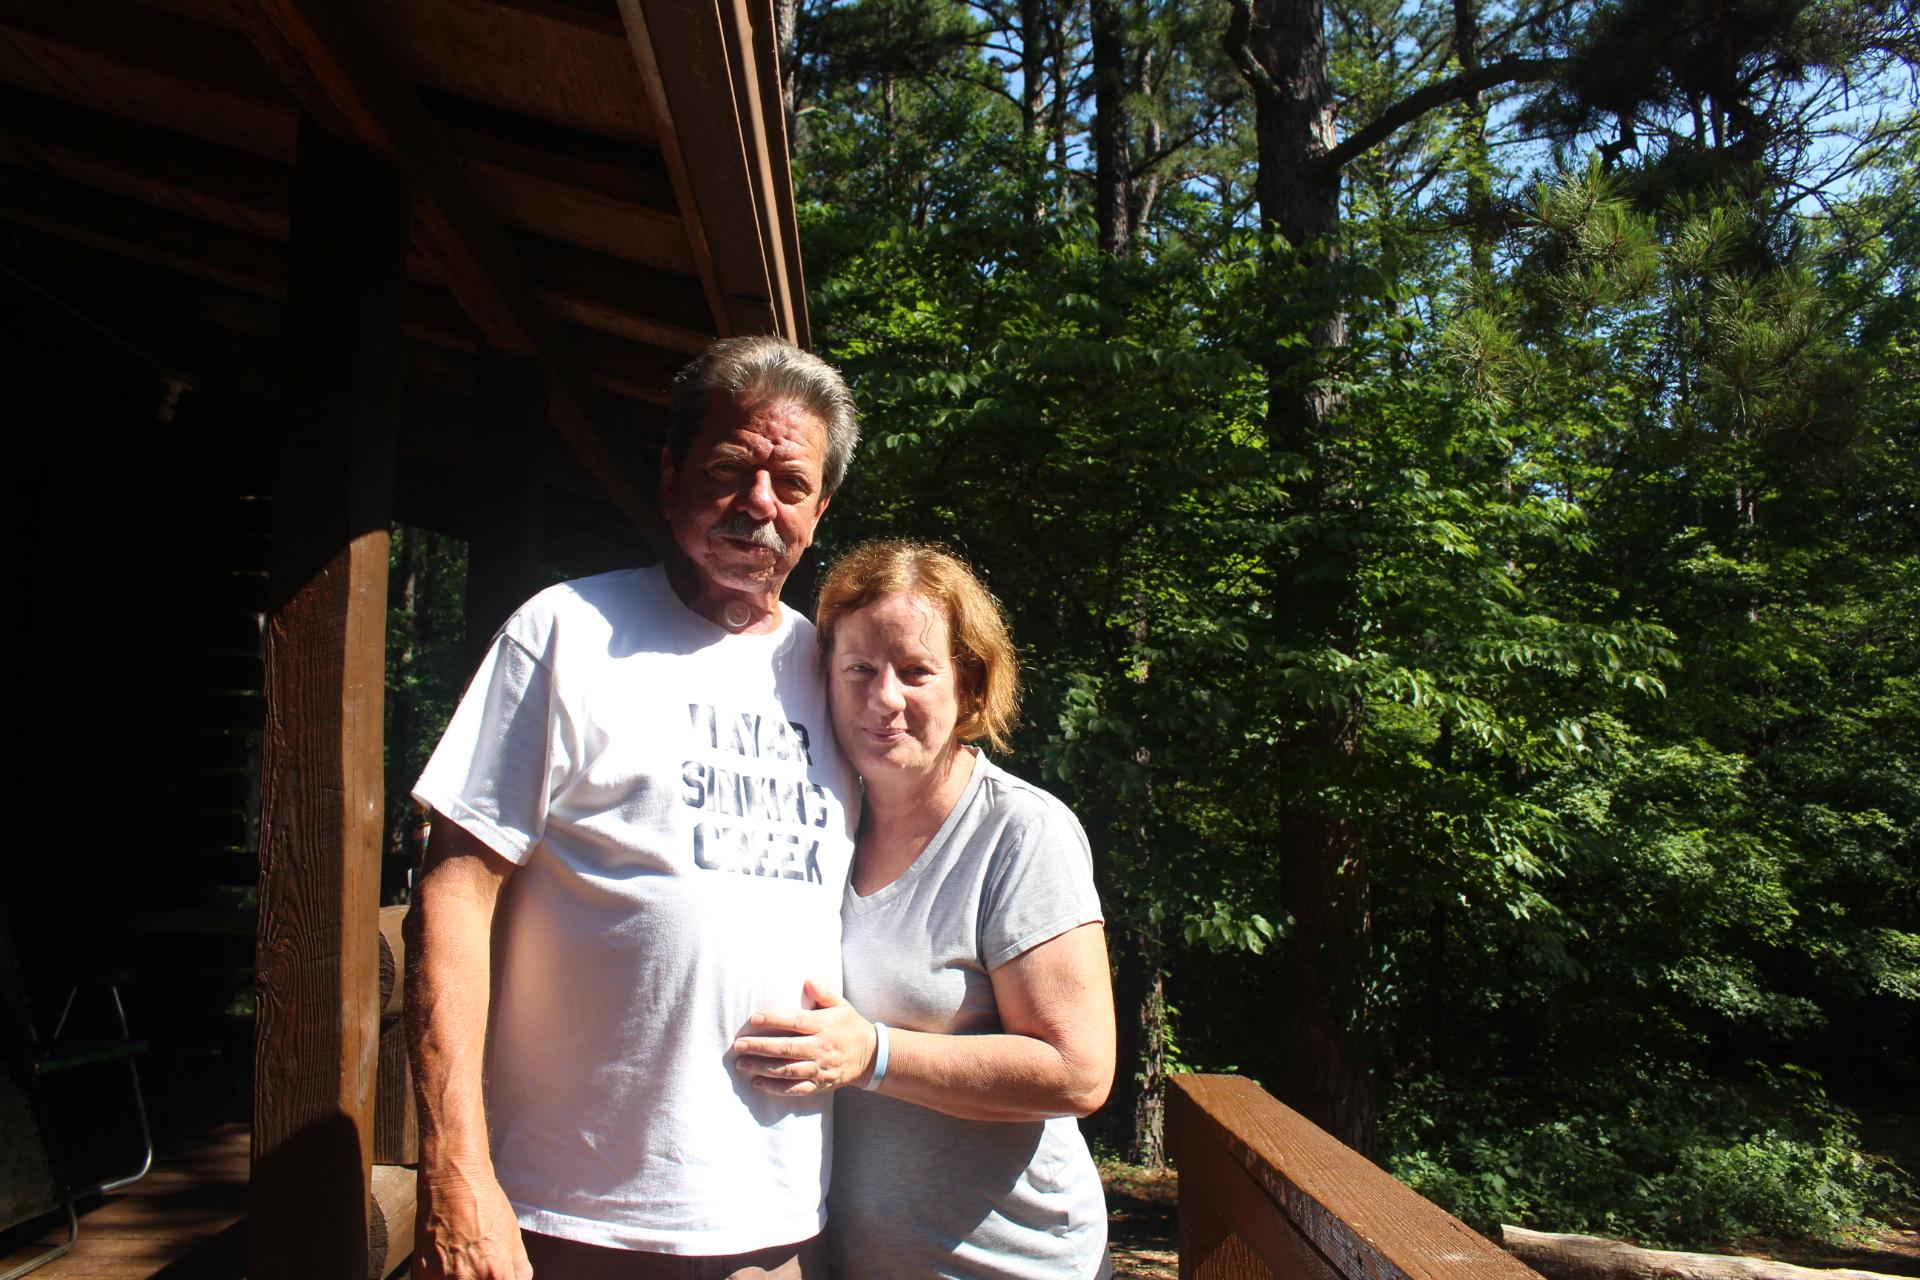 Ted-Cheryl together lodge steps